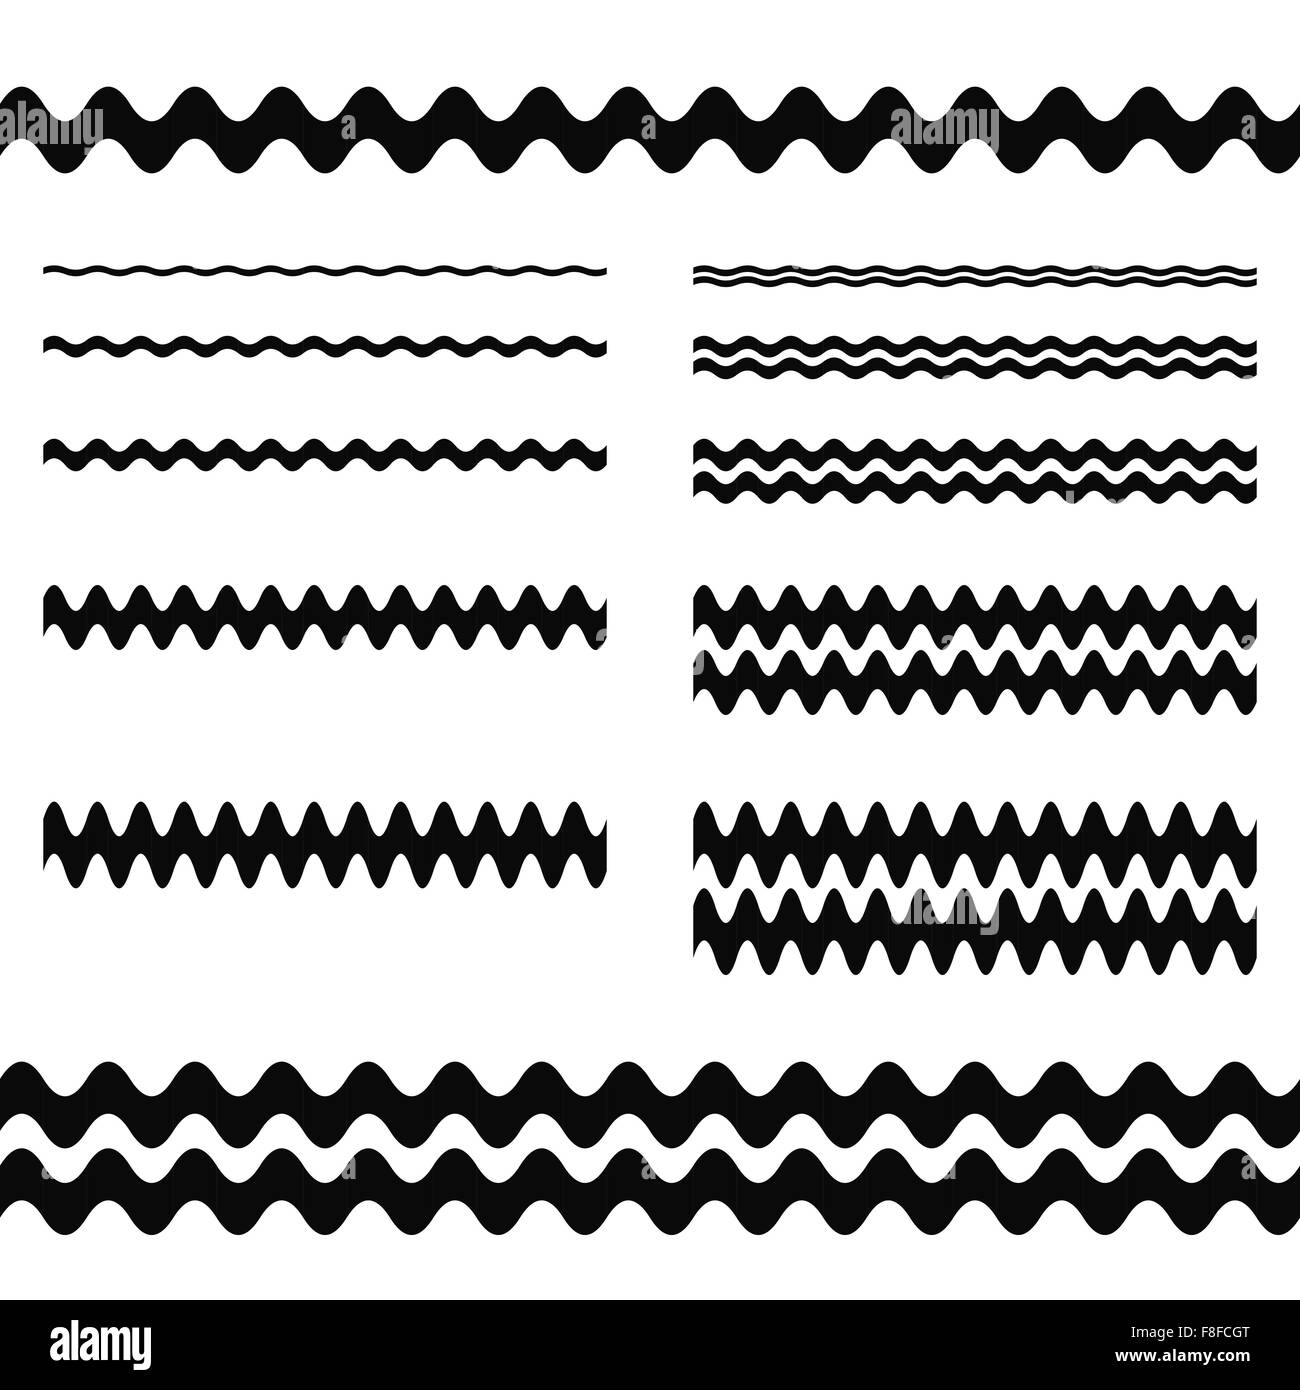 Graphic Design Elements Line : Curly line divider pixshark images galleries